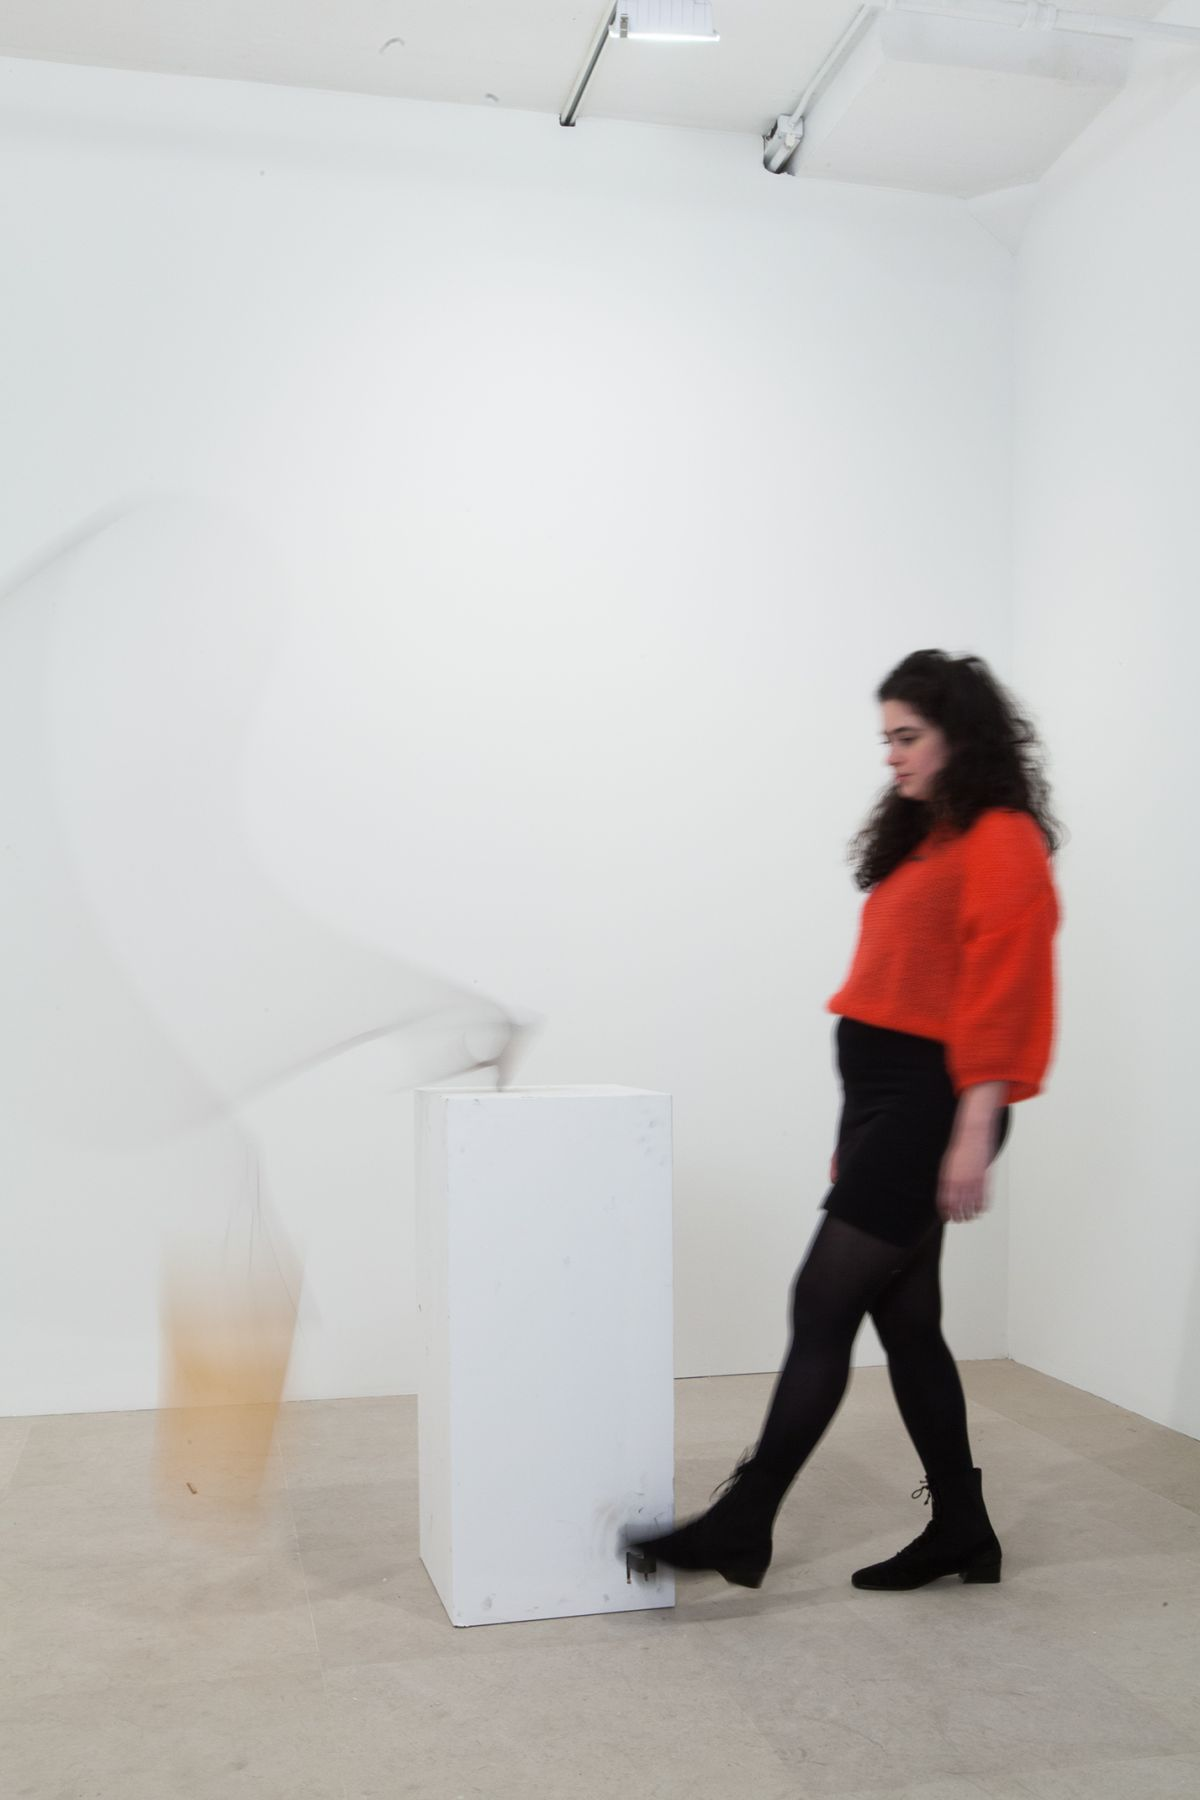 Gelitin, Beckett Bucket, 2012, Mixed media, 82 x 44 x 19 inches